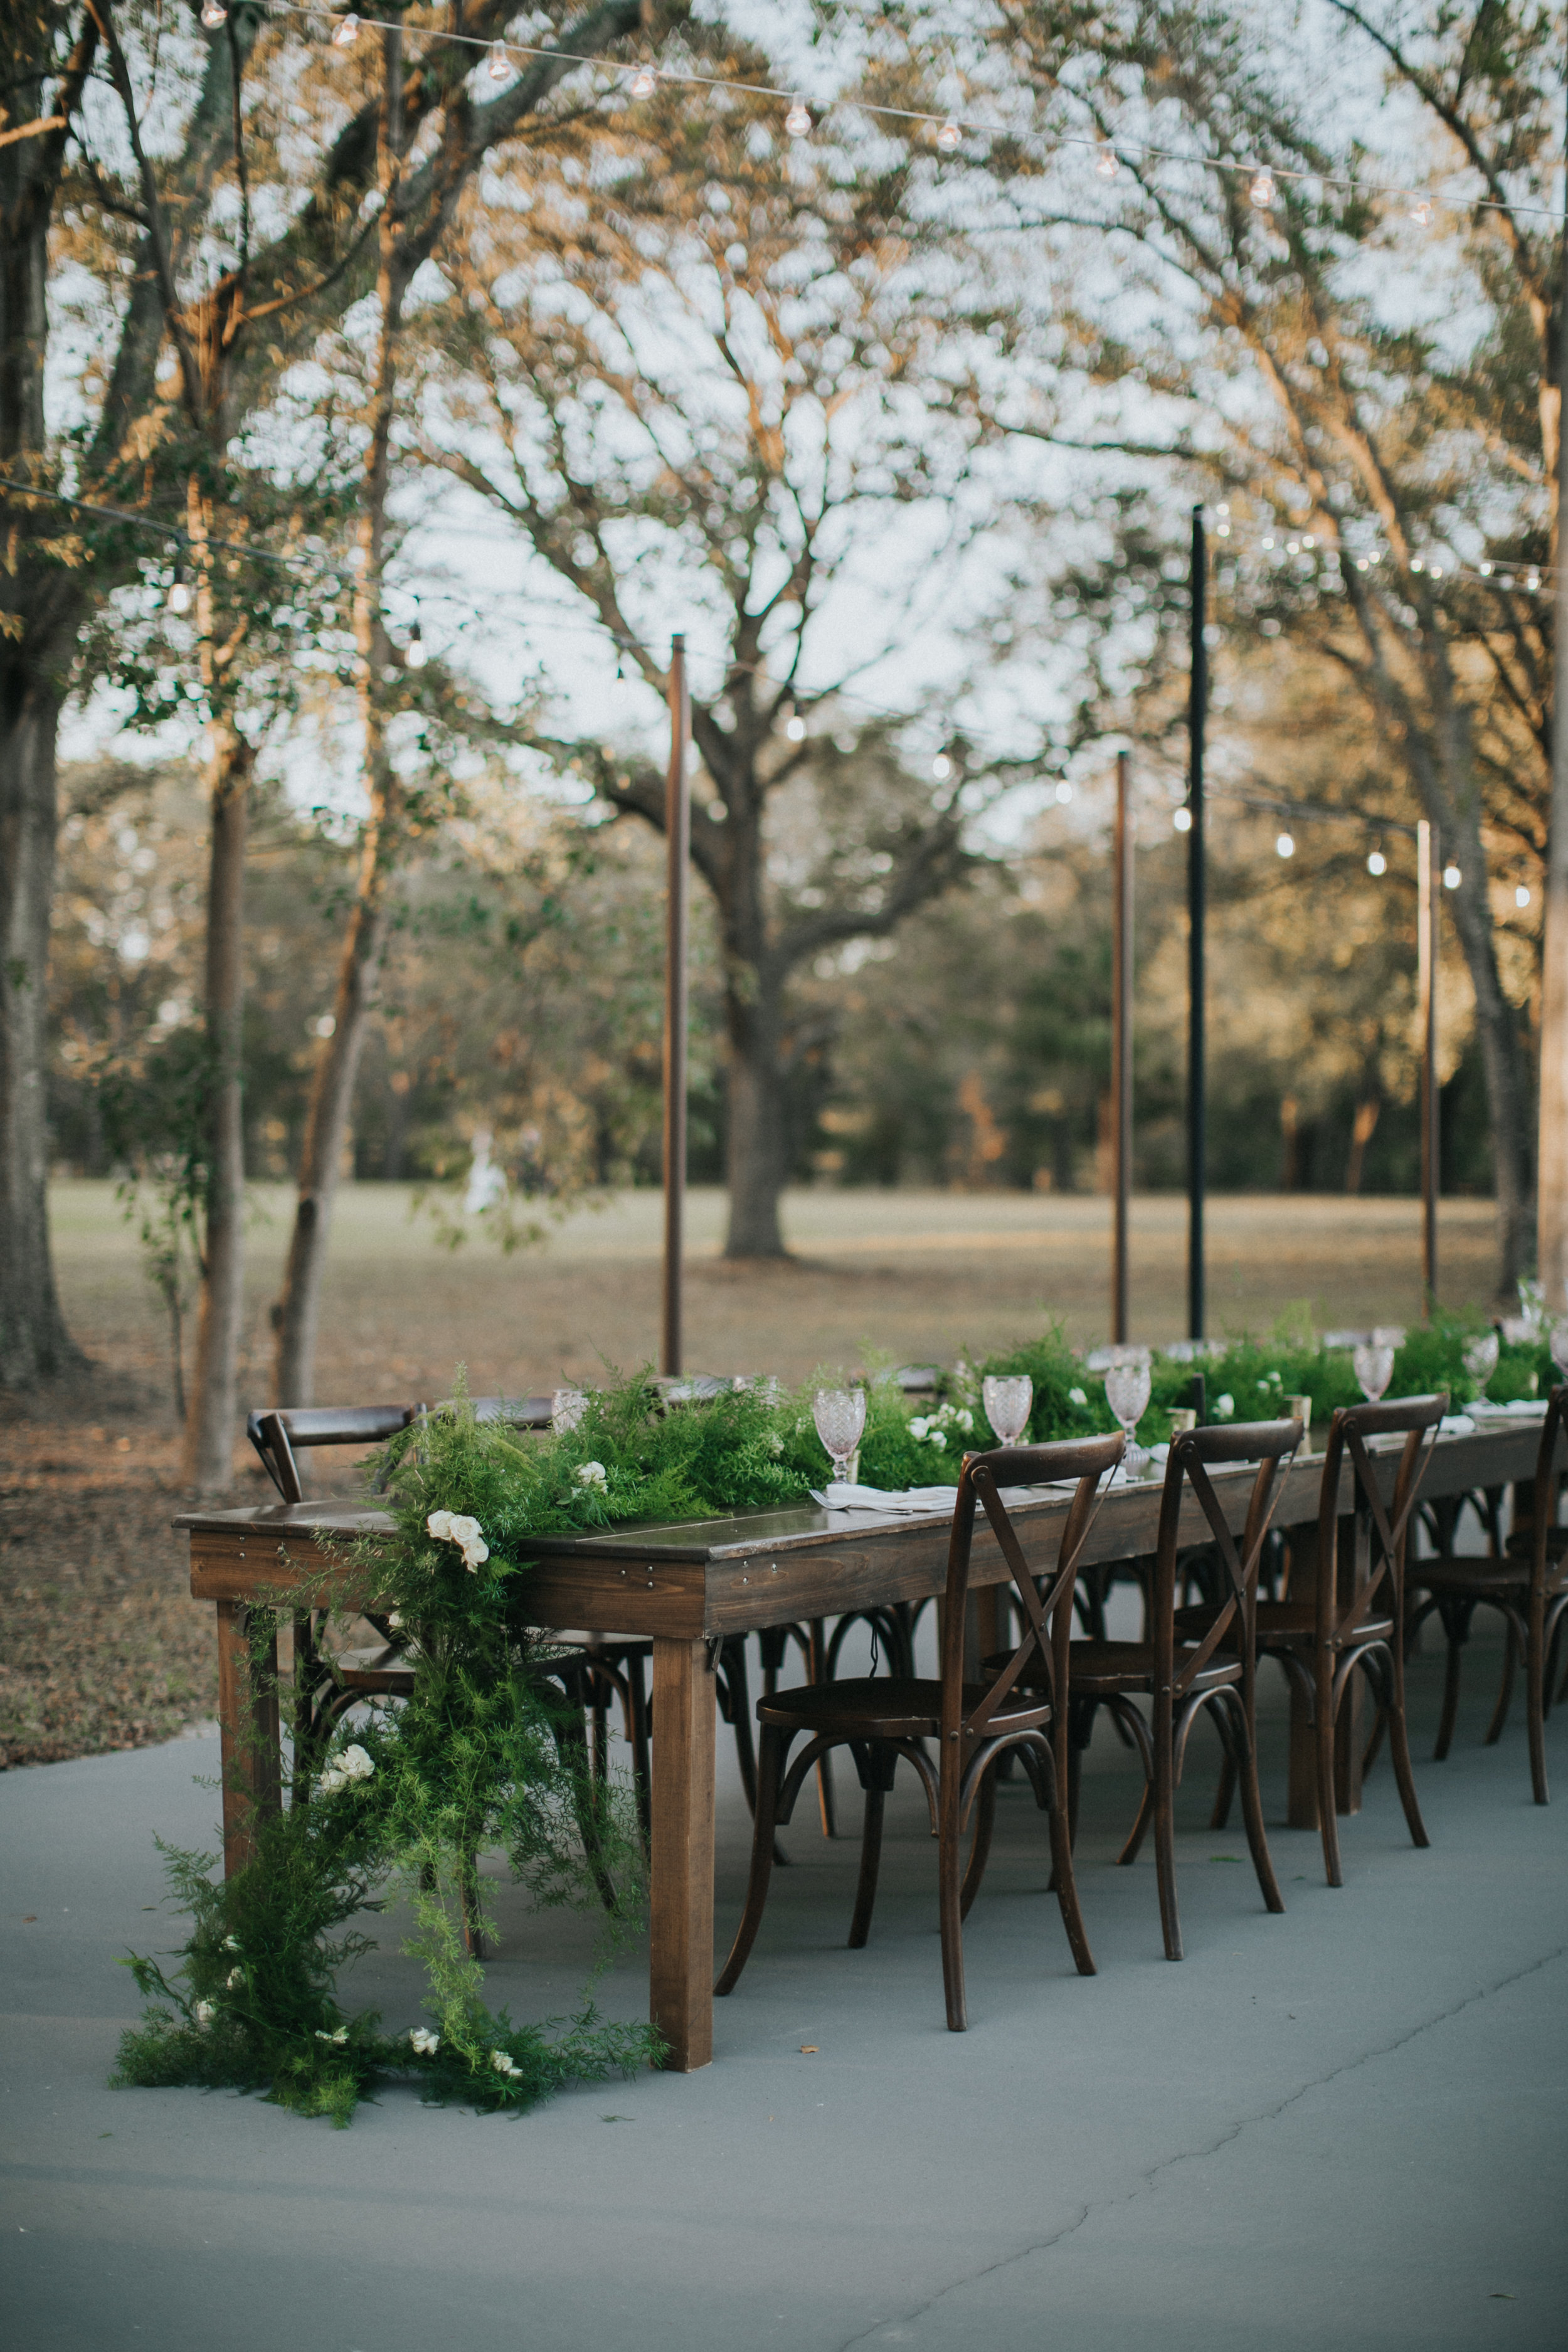 Wedding reception farm tables from Orlando Wedding & Party Rentals